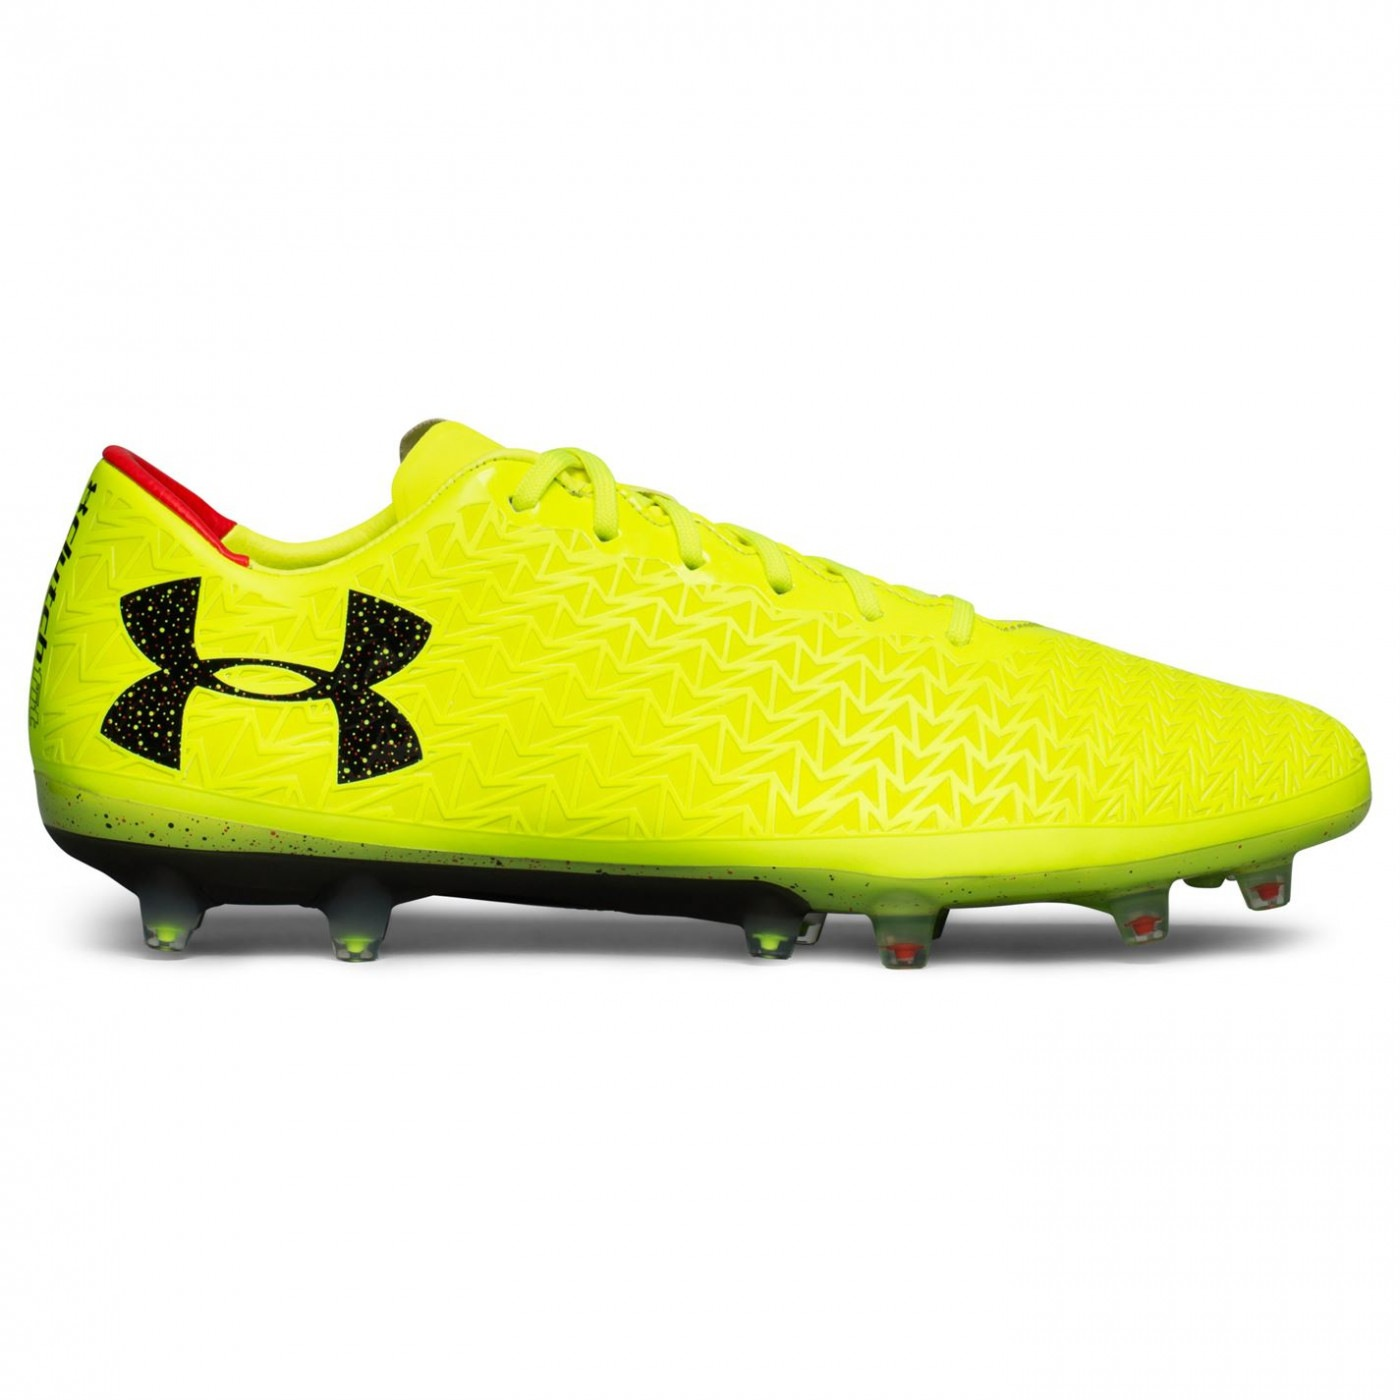 Under Armour Clutchfit 3.0 Mens FG Football Boots